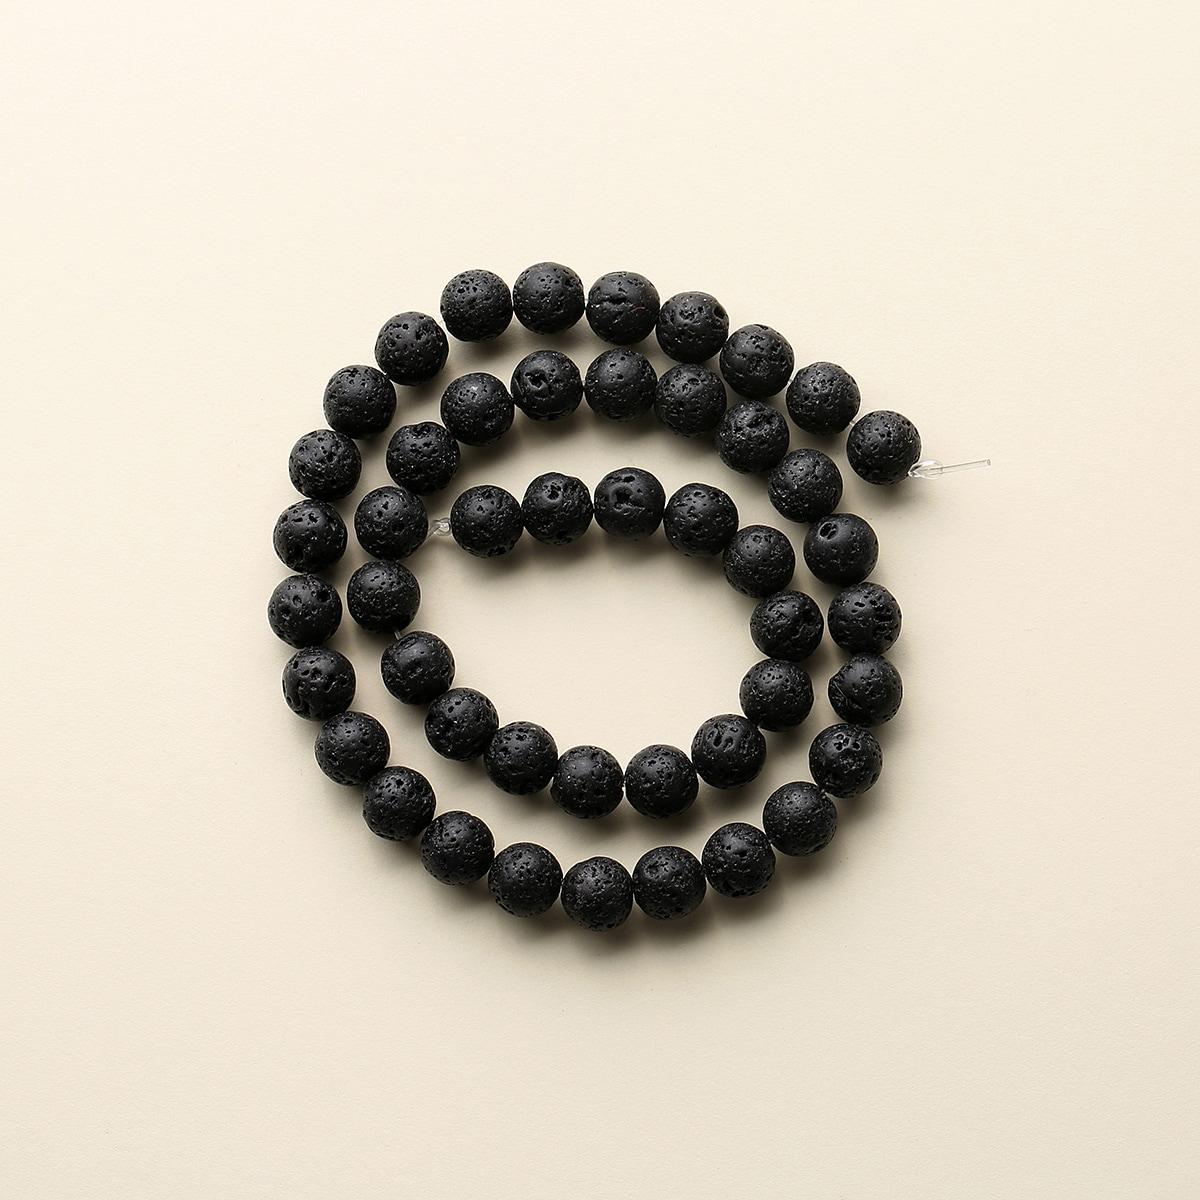 8MM Bead DIY Jewelry Accessory